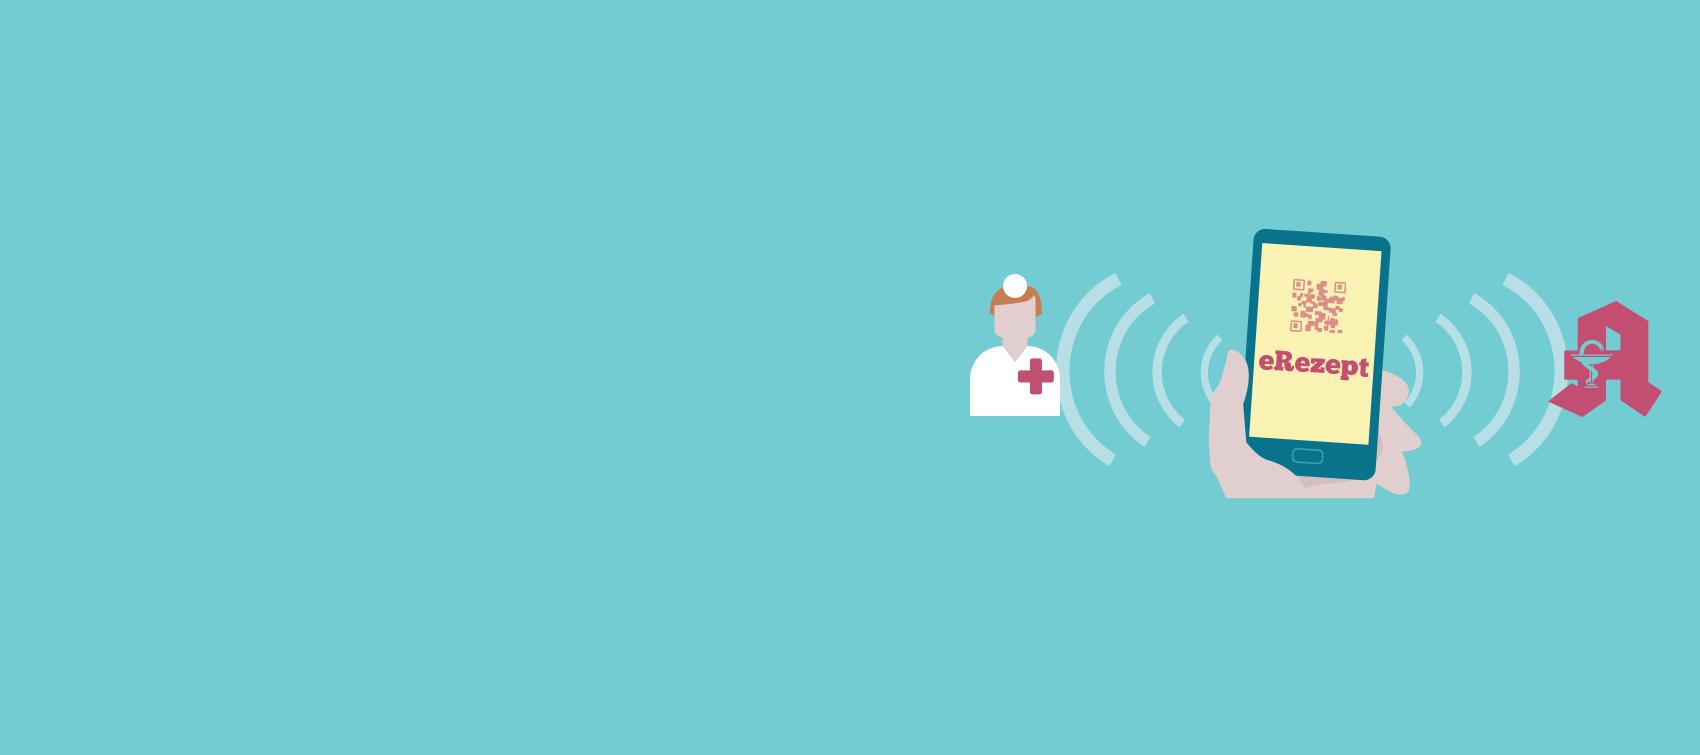 Illustration zum E-Rezept. Ein Mobiltelefon verknüpft Apotheke und Arzt.